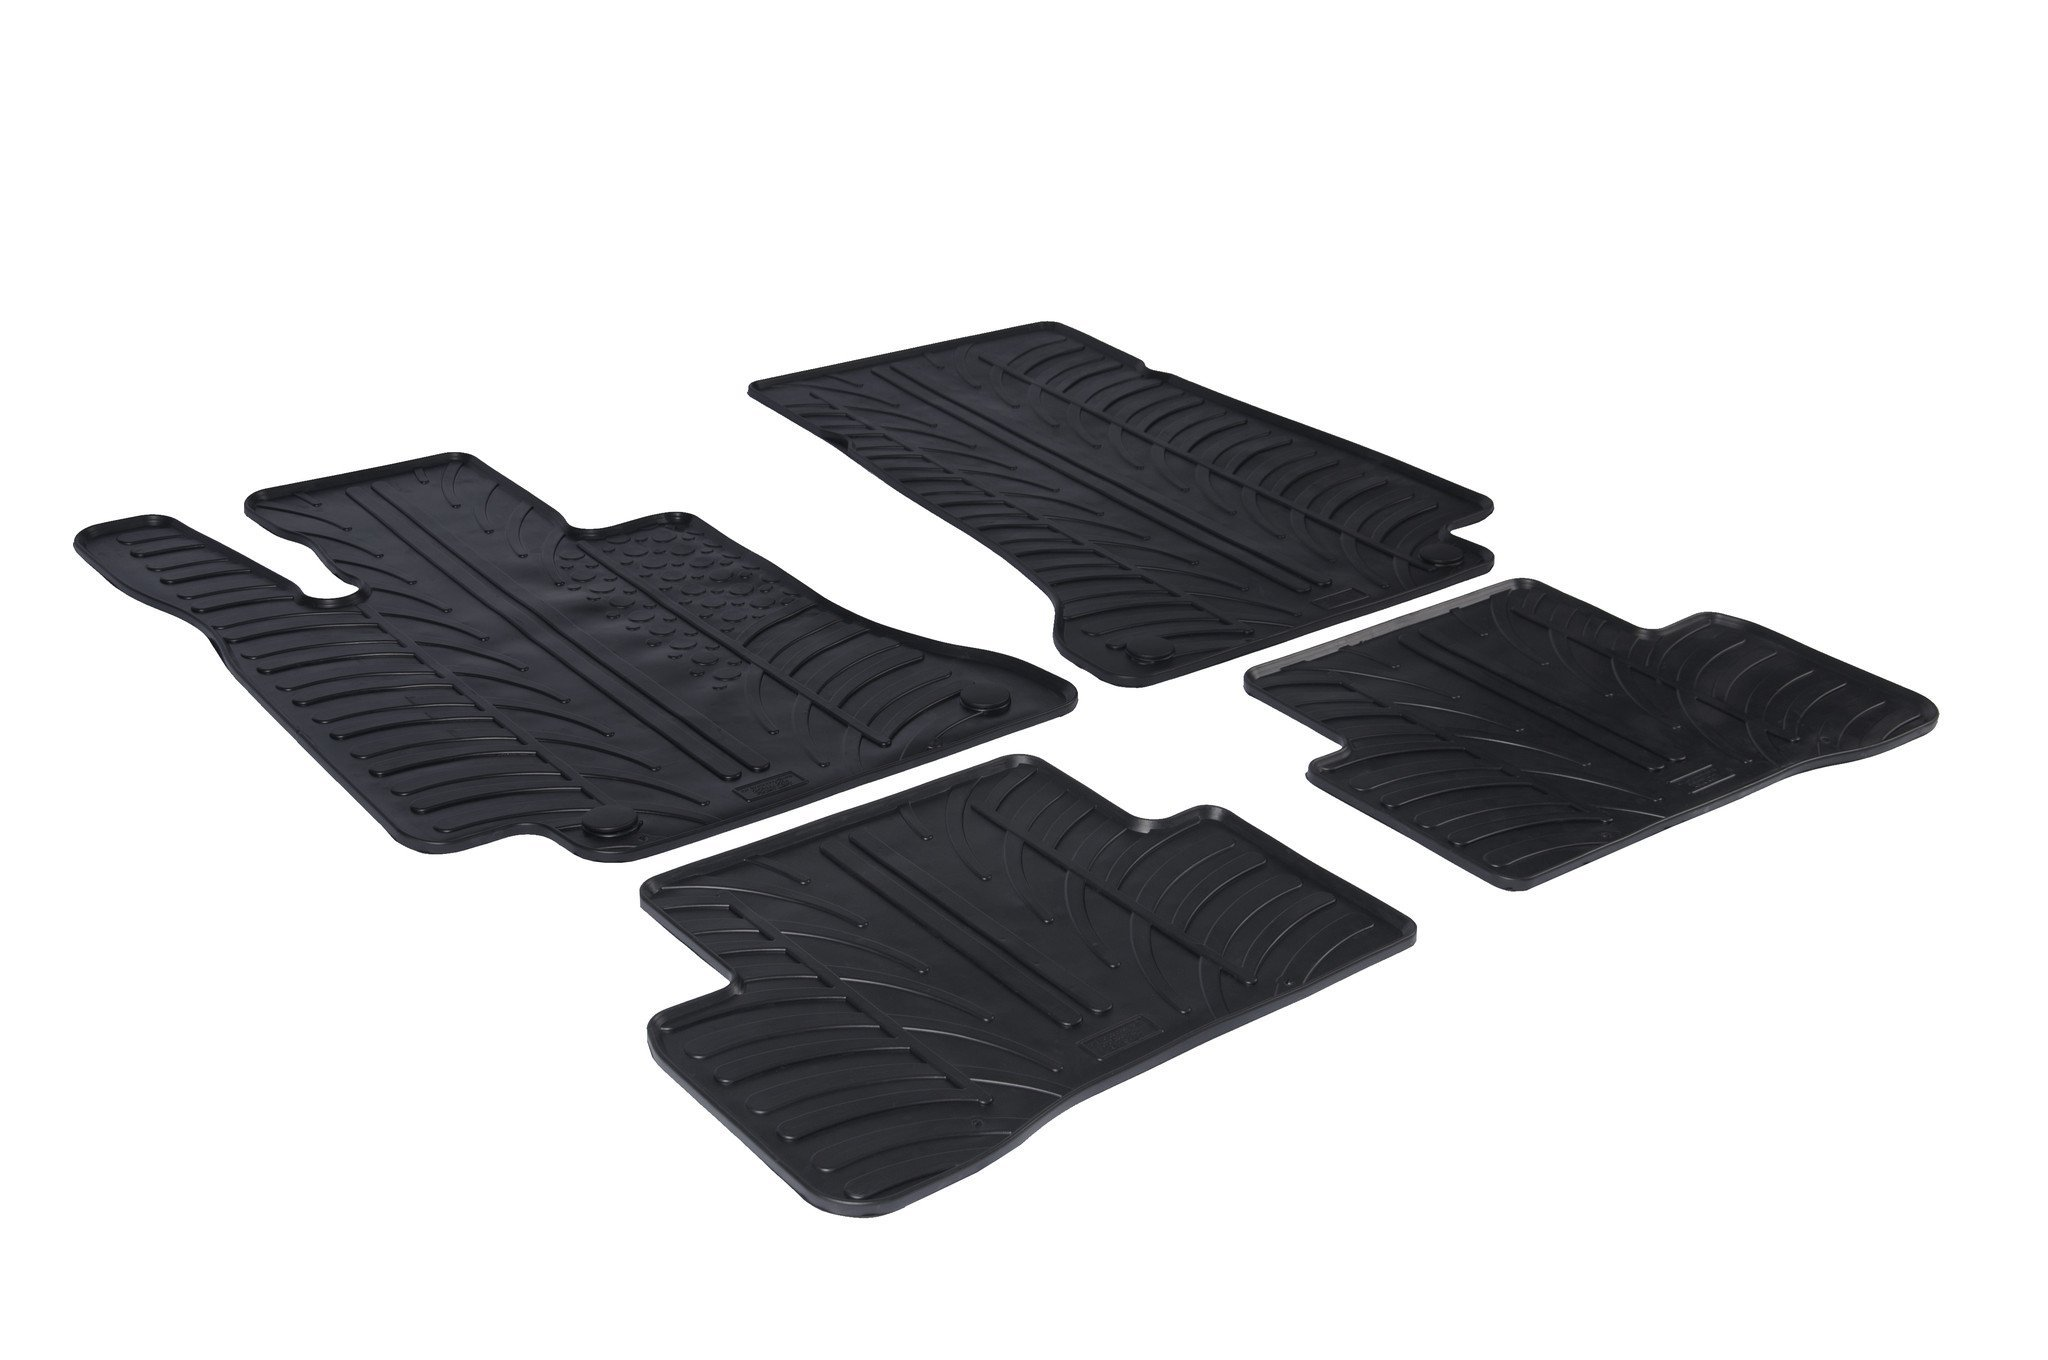 Gledring RHD 0224 Front Rear Car Floor Mat Set 4 Pieces Tailored Rubber Black